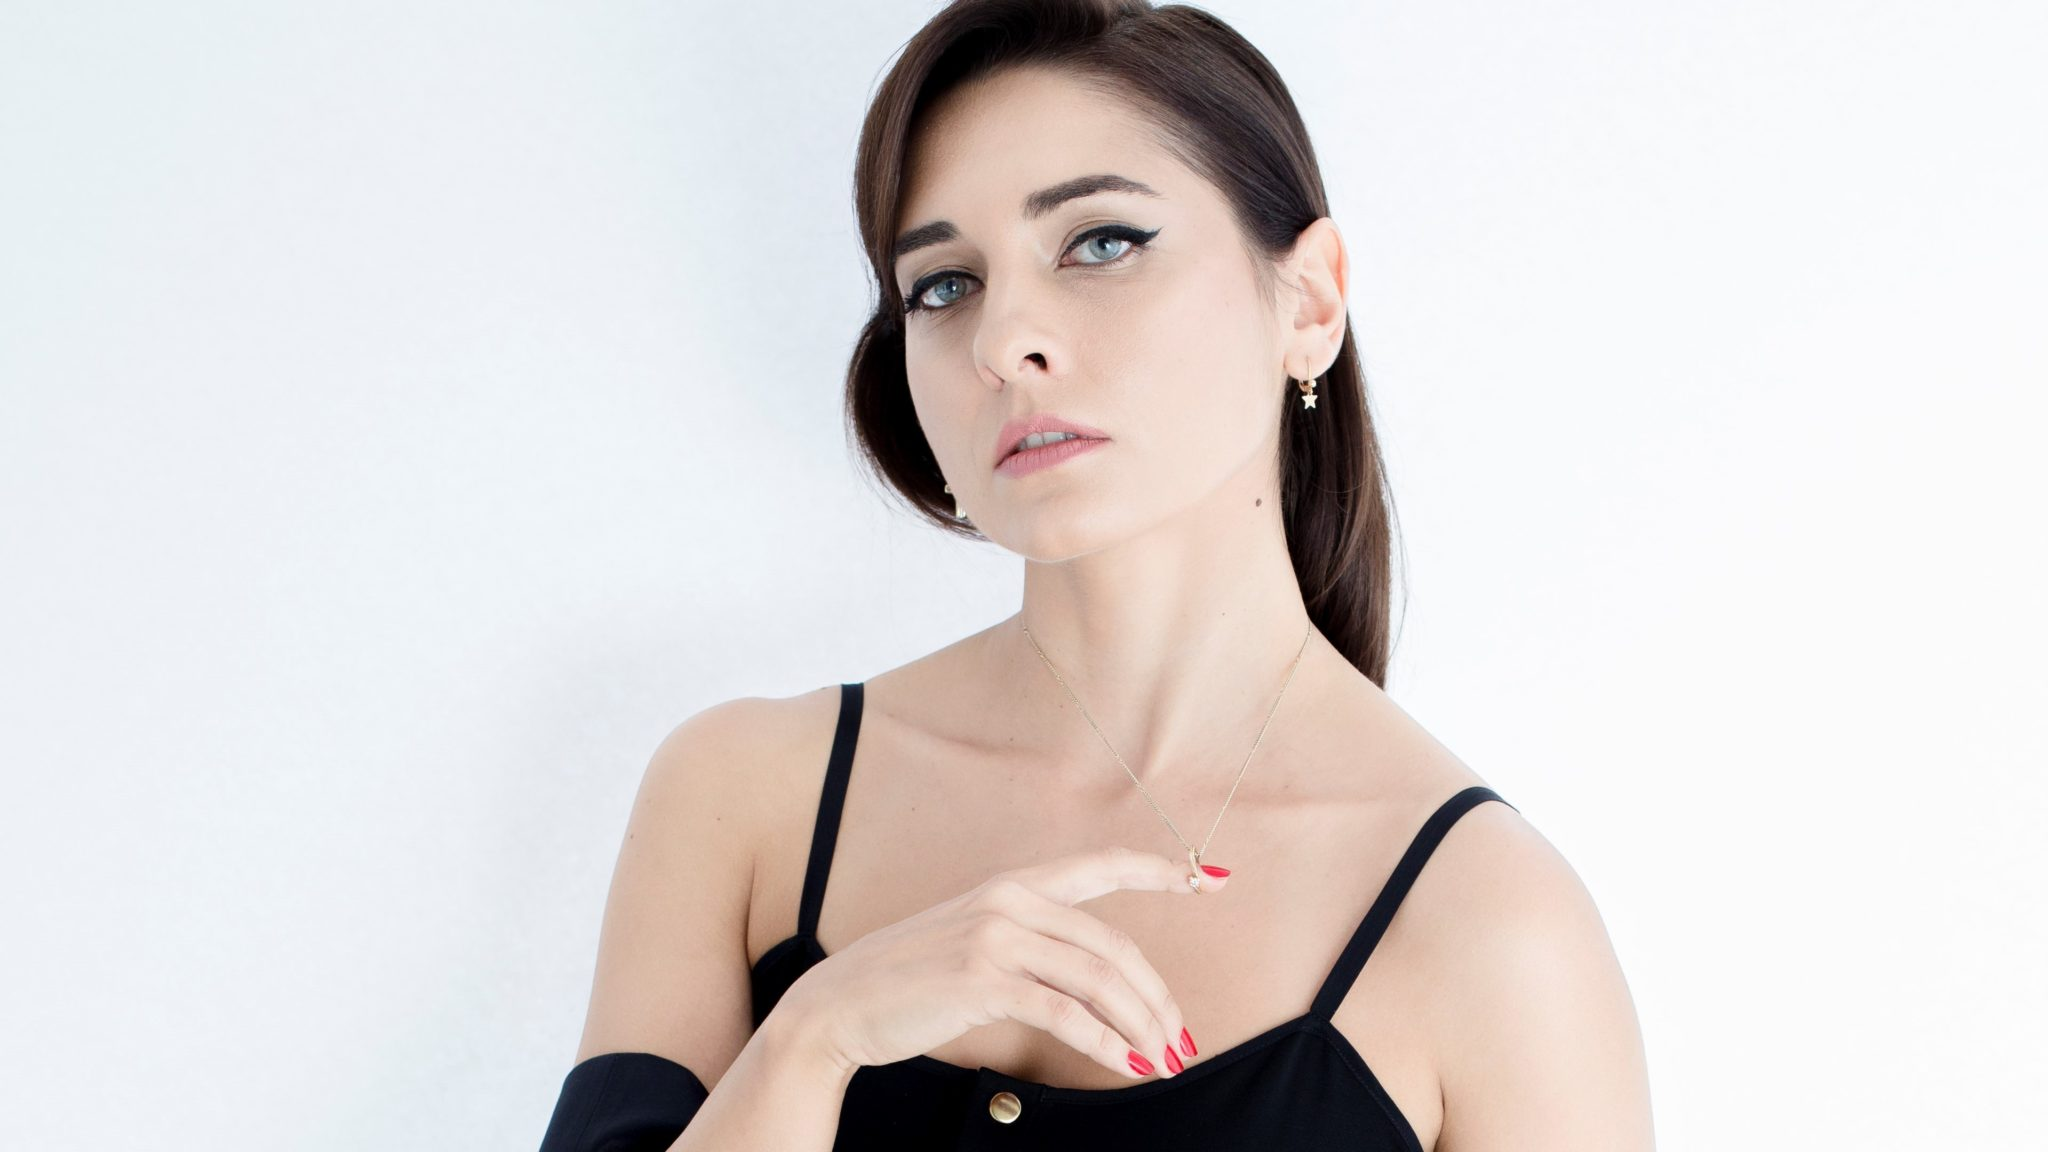 (#AIconicpeople) Andreea Bădală